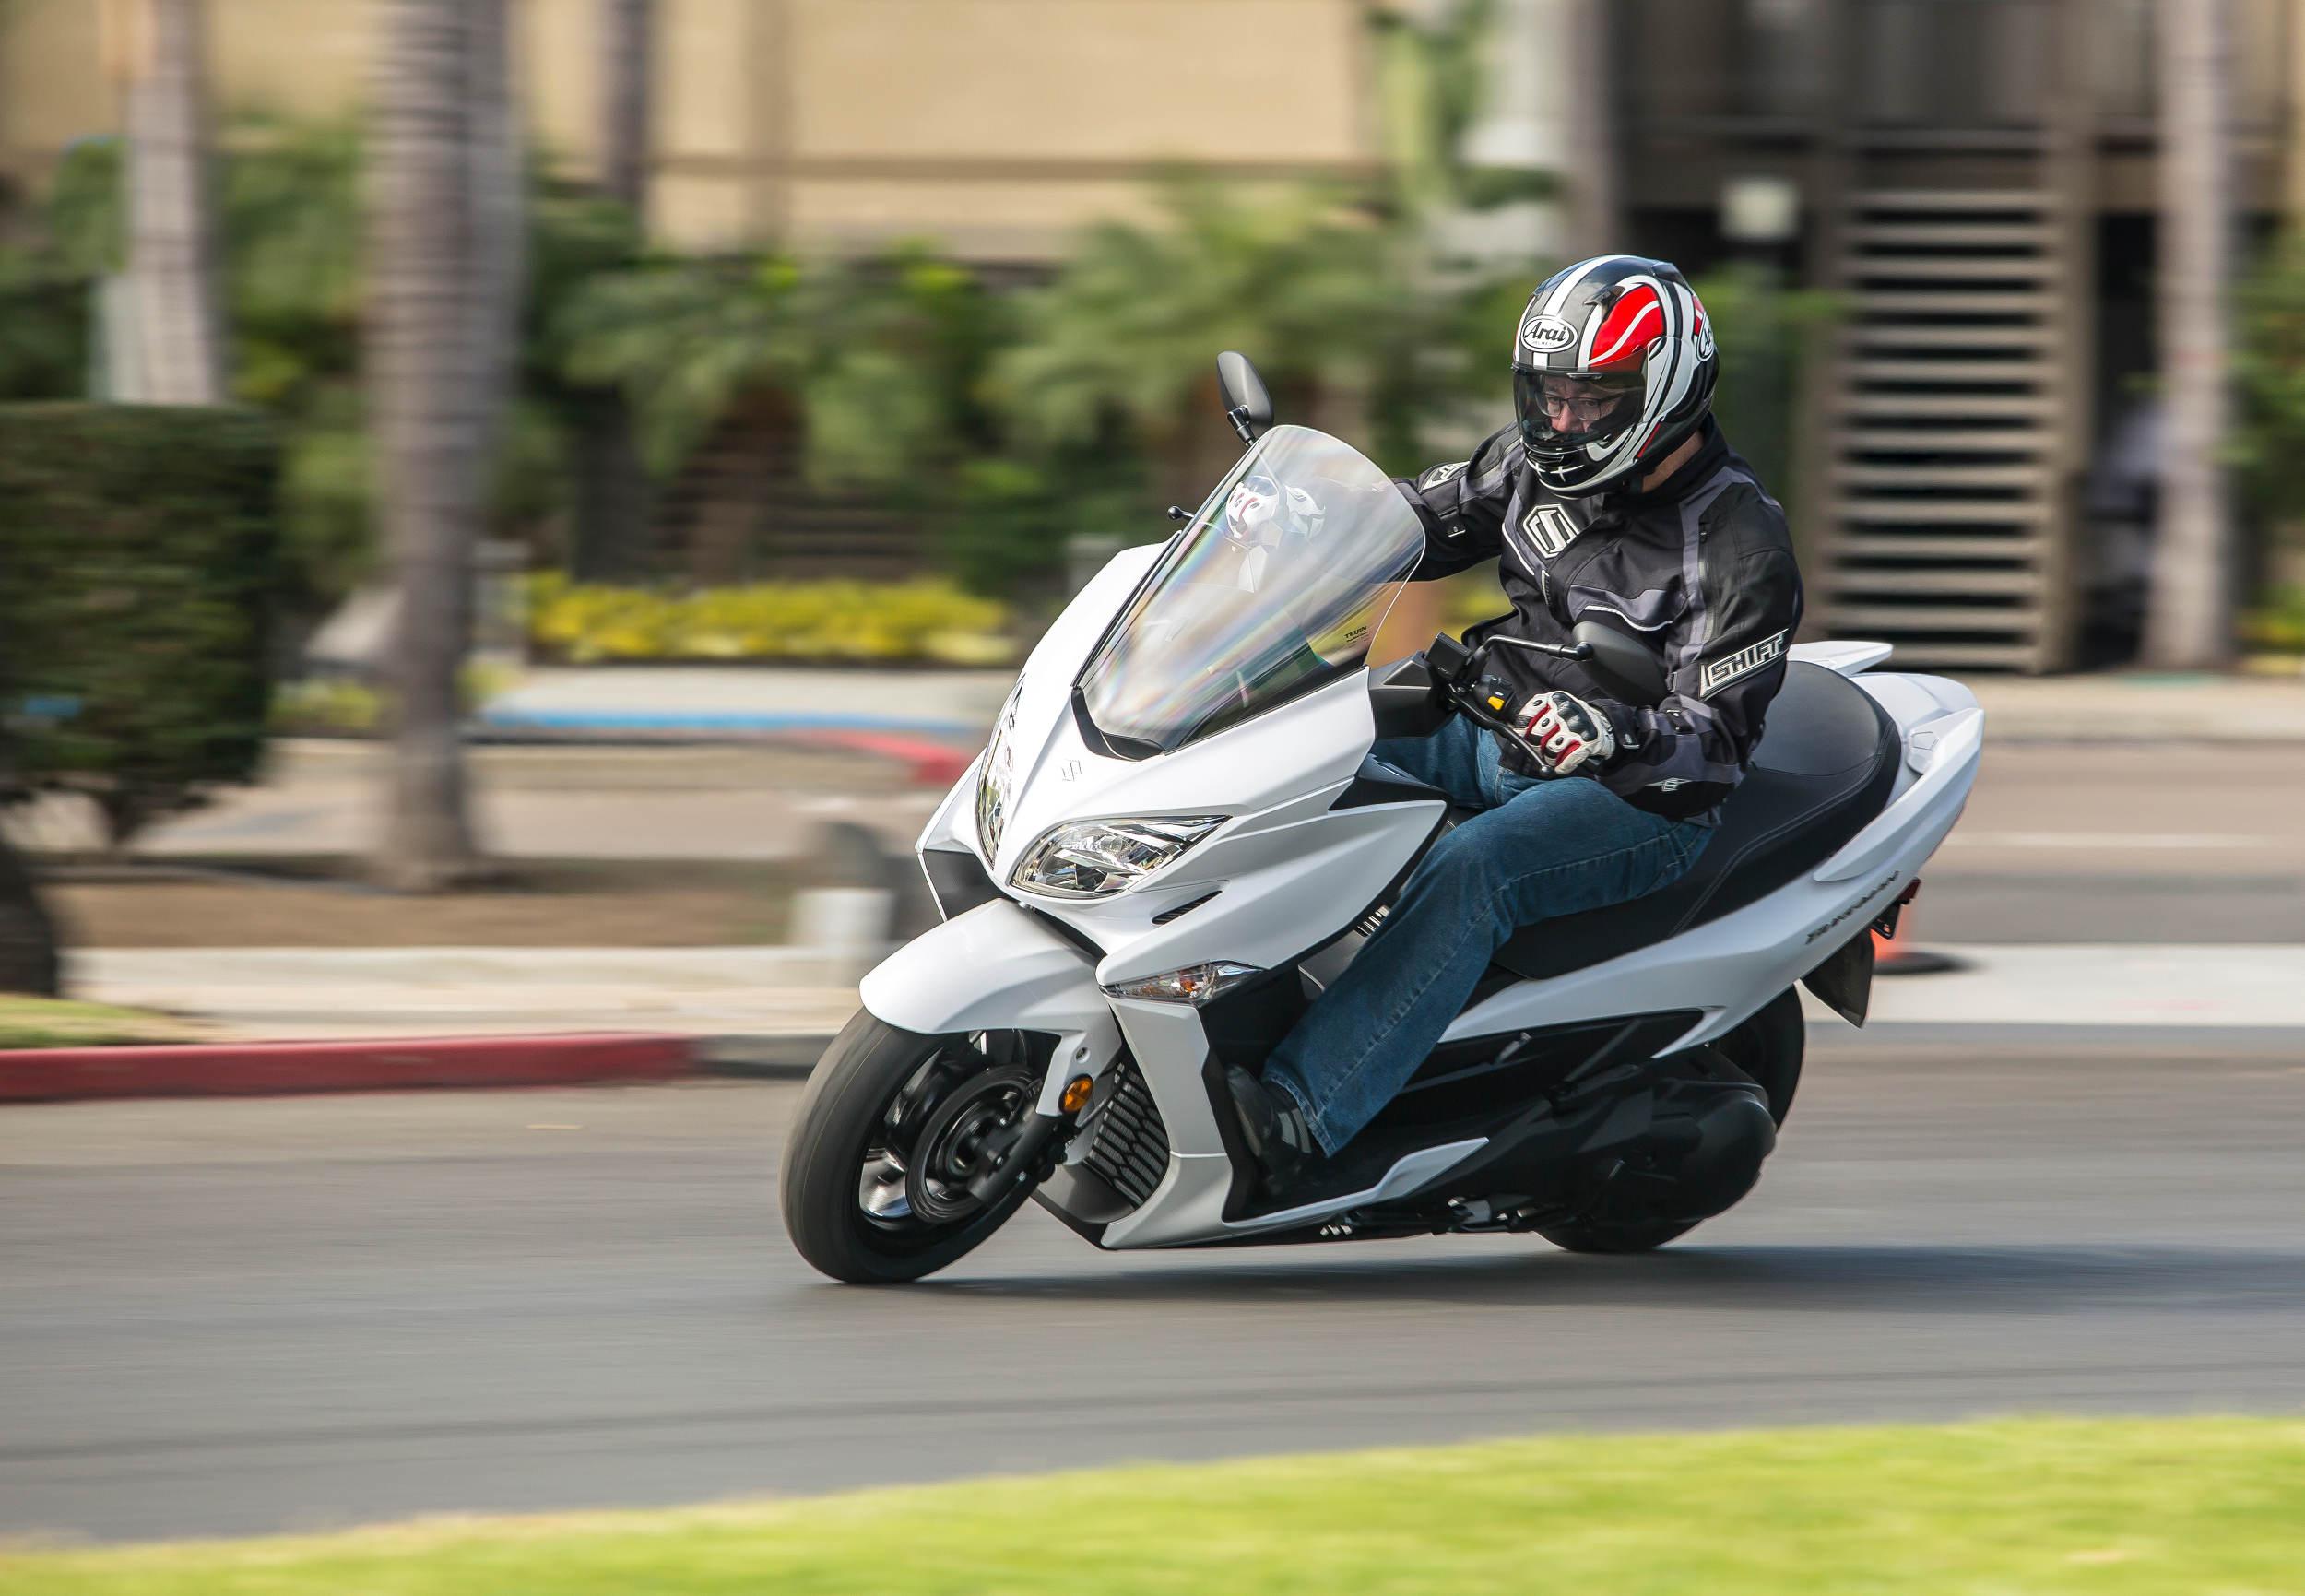 2018 suzuki burgman 400 md first ride motorcycle news editorials. Black Bedroom Furniture Sets. Home Design Ideas